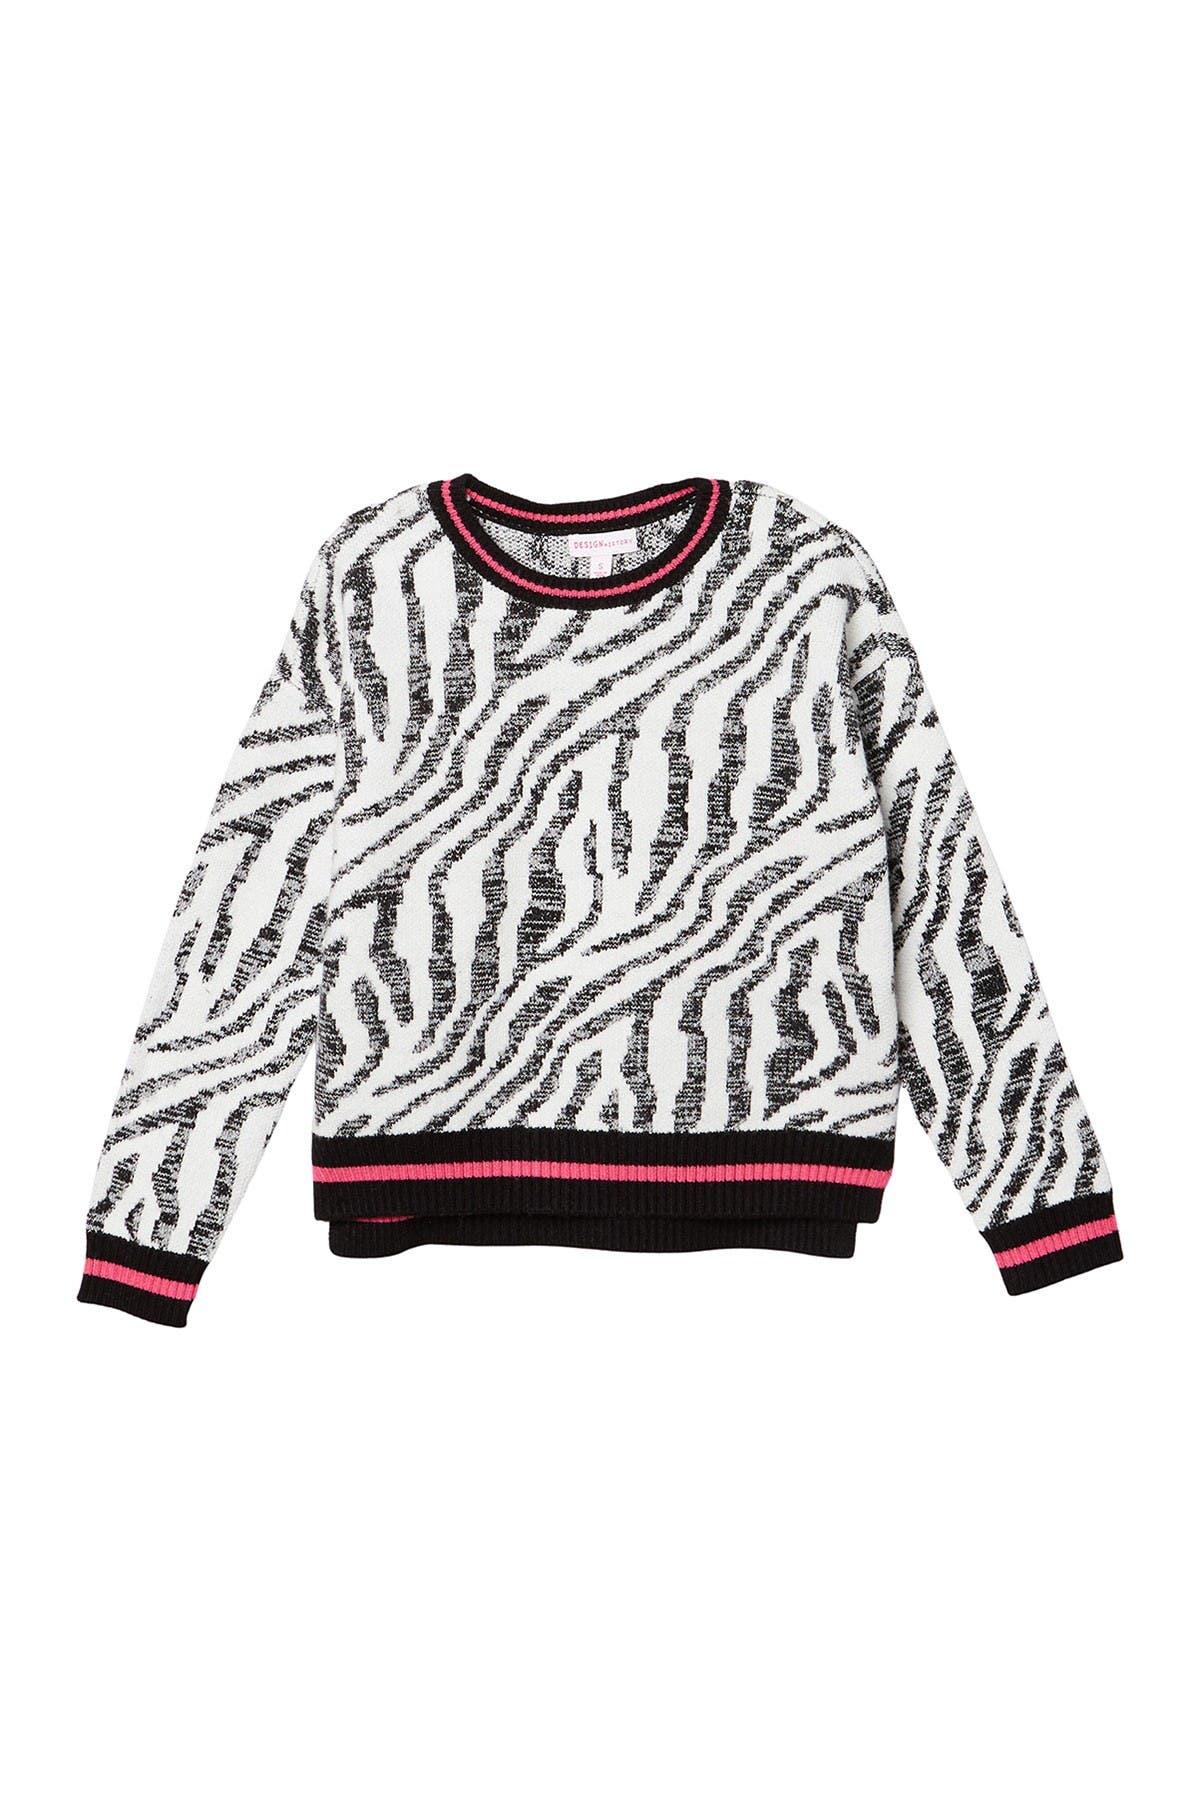 Image of Design History Zebra Sweater